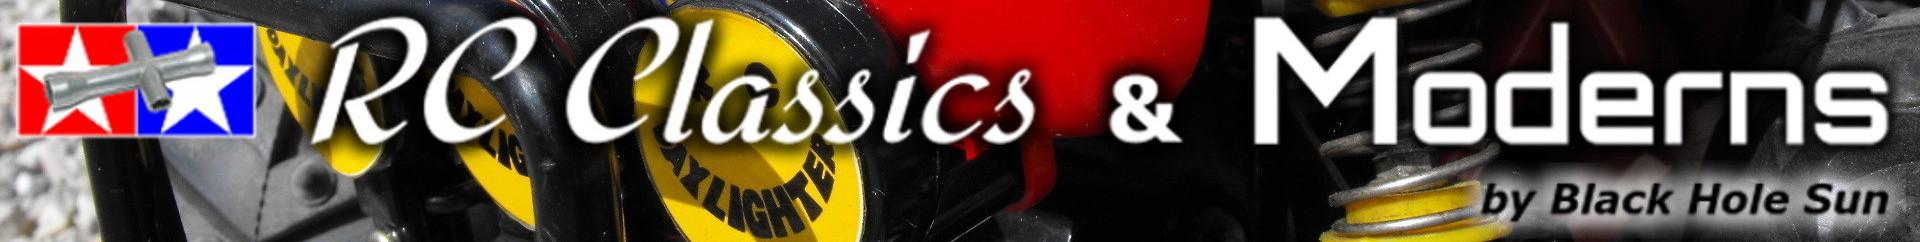 Tamiya RC Classics & Moderns